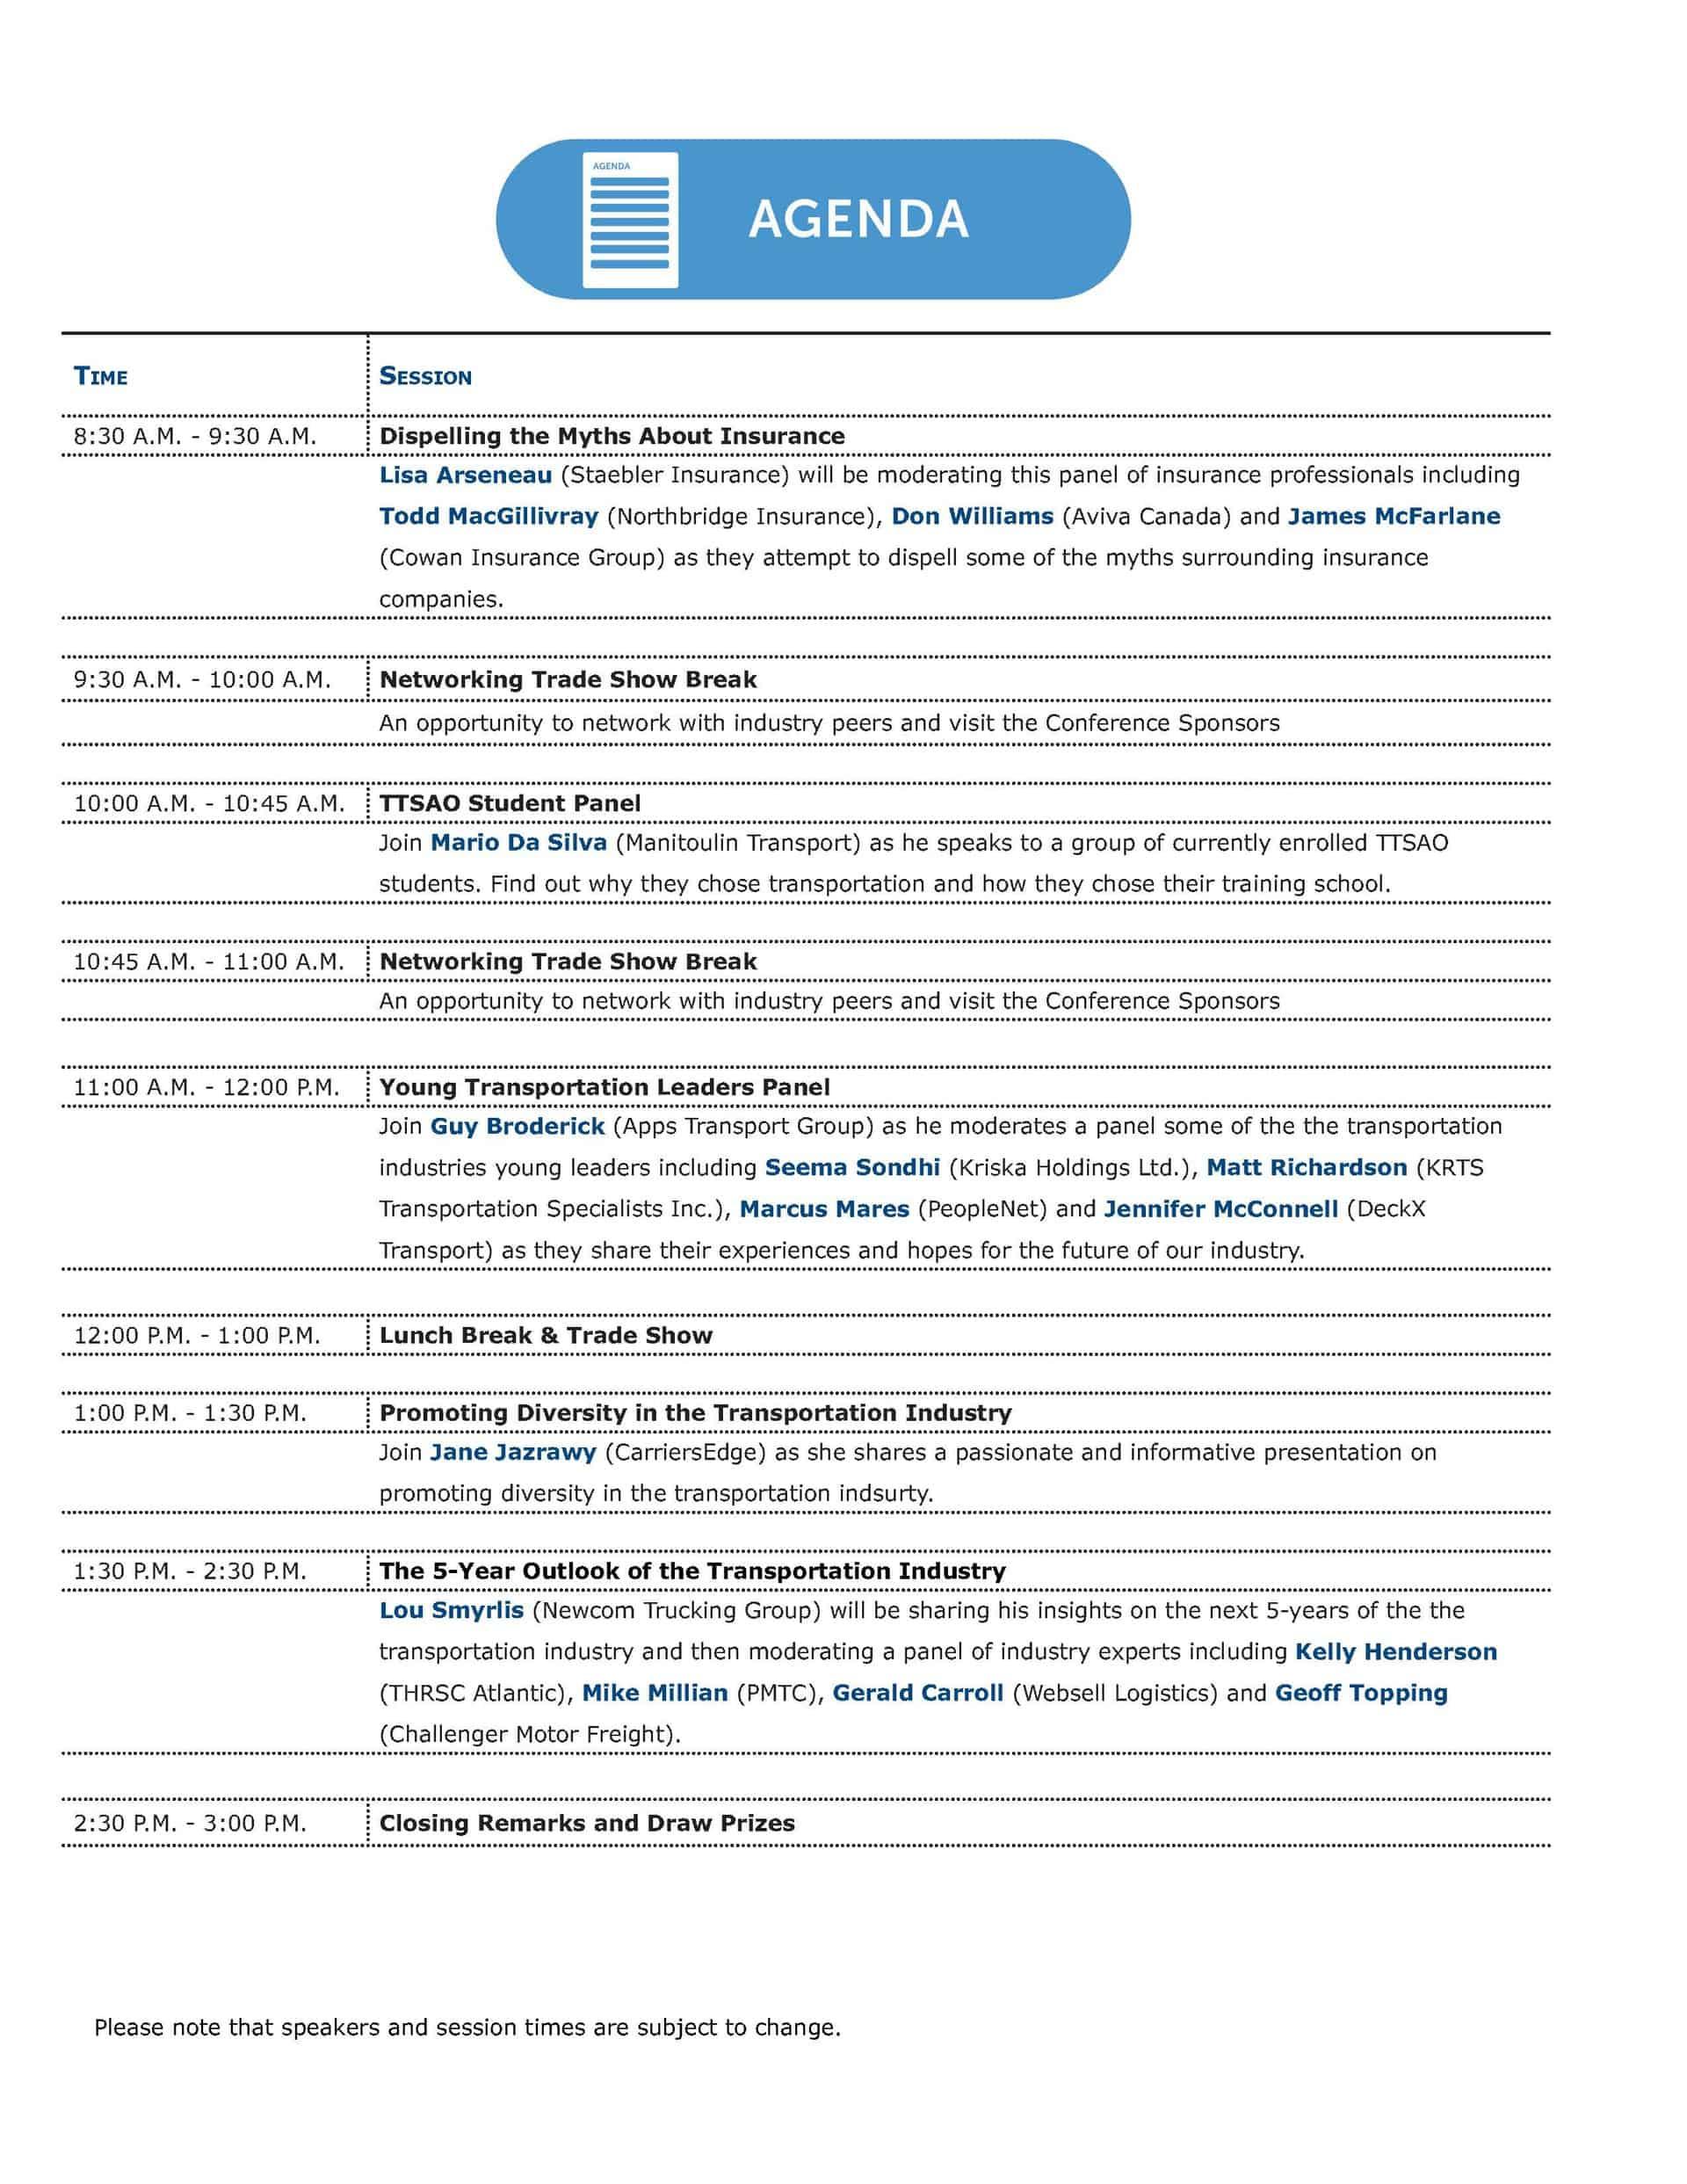 TTSAO Agenda Feb 23rd _Page_2